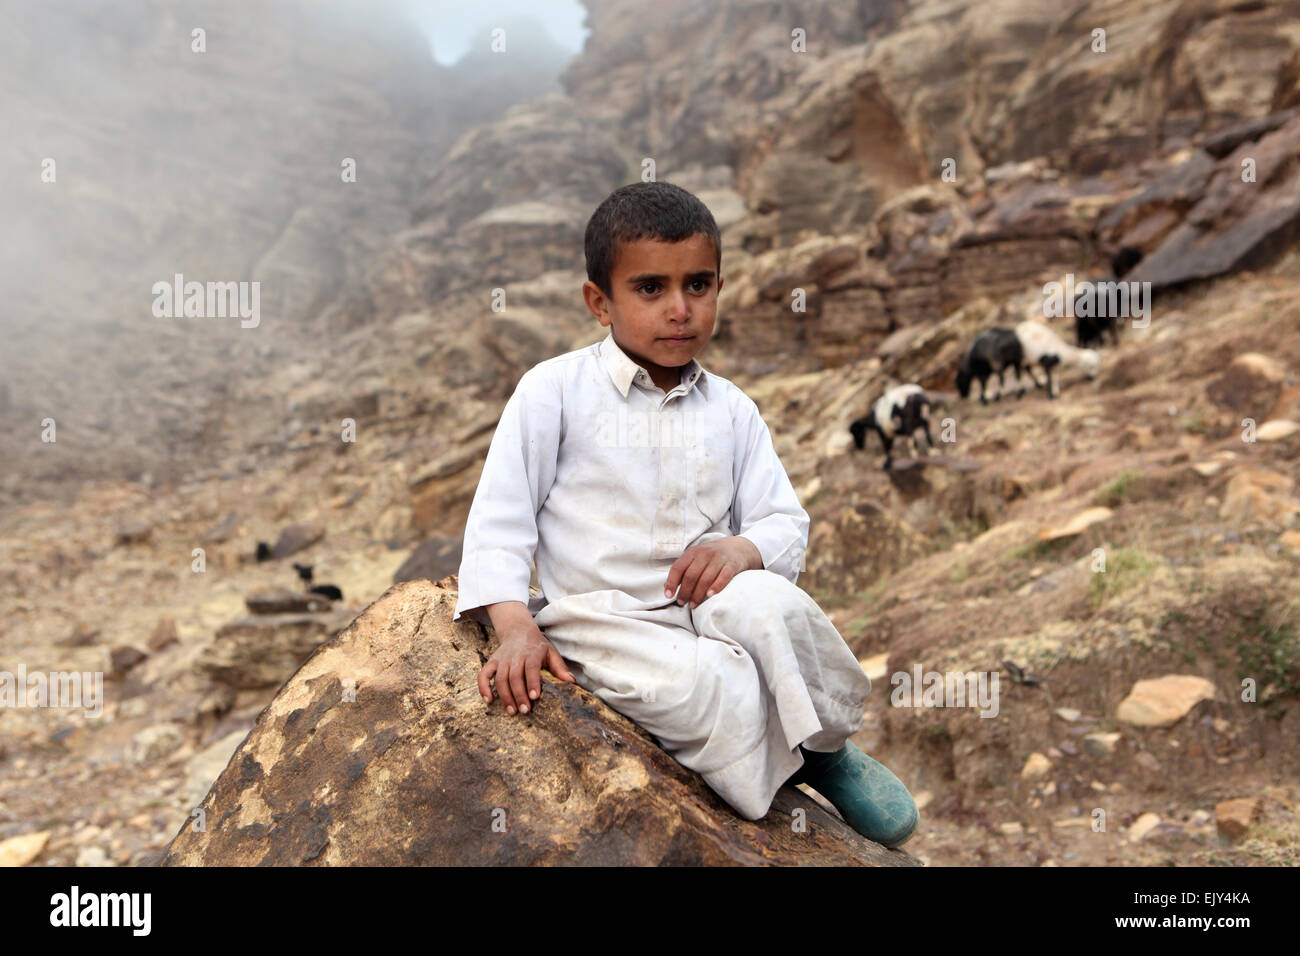 A young boy in Kawkaban, Yemen. - Stock Image